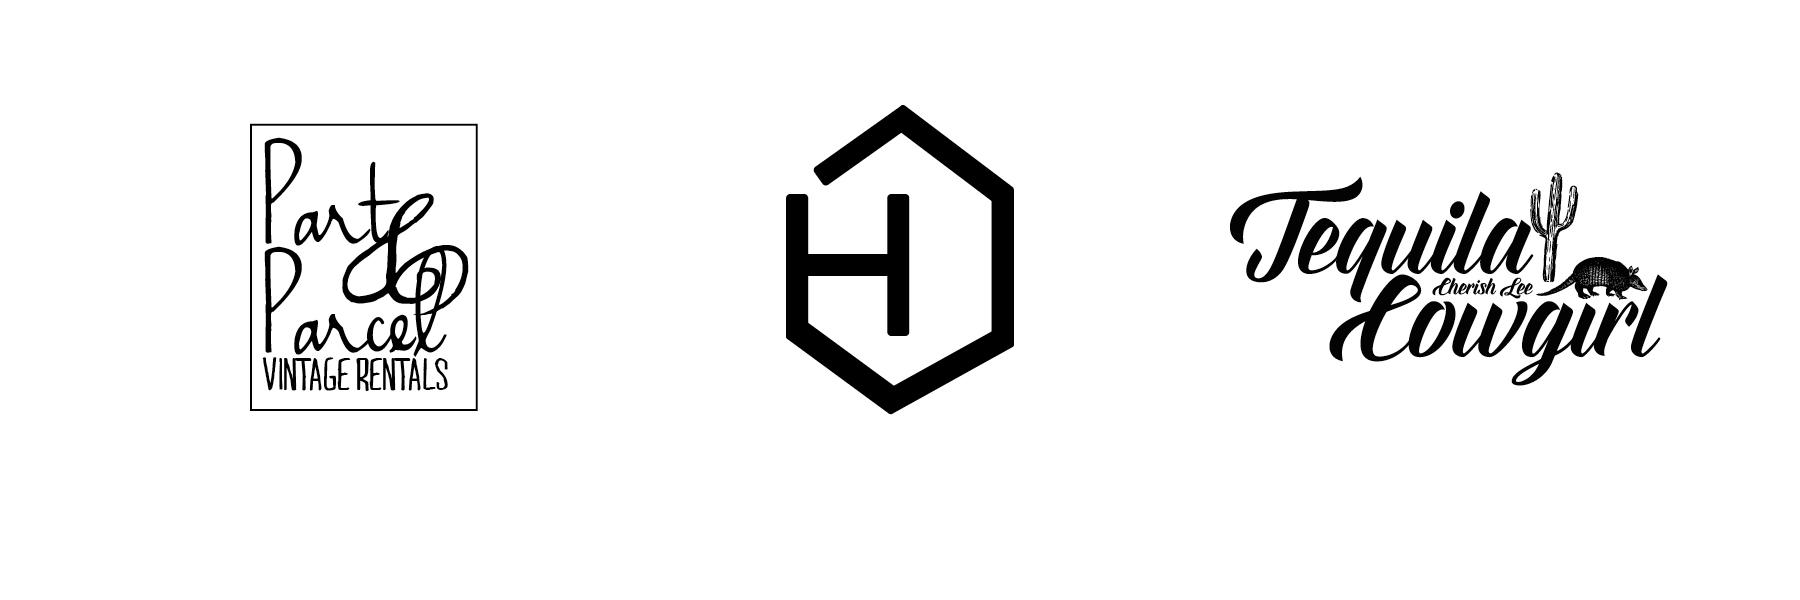 Logoscroll#5.jpg